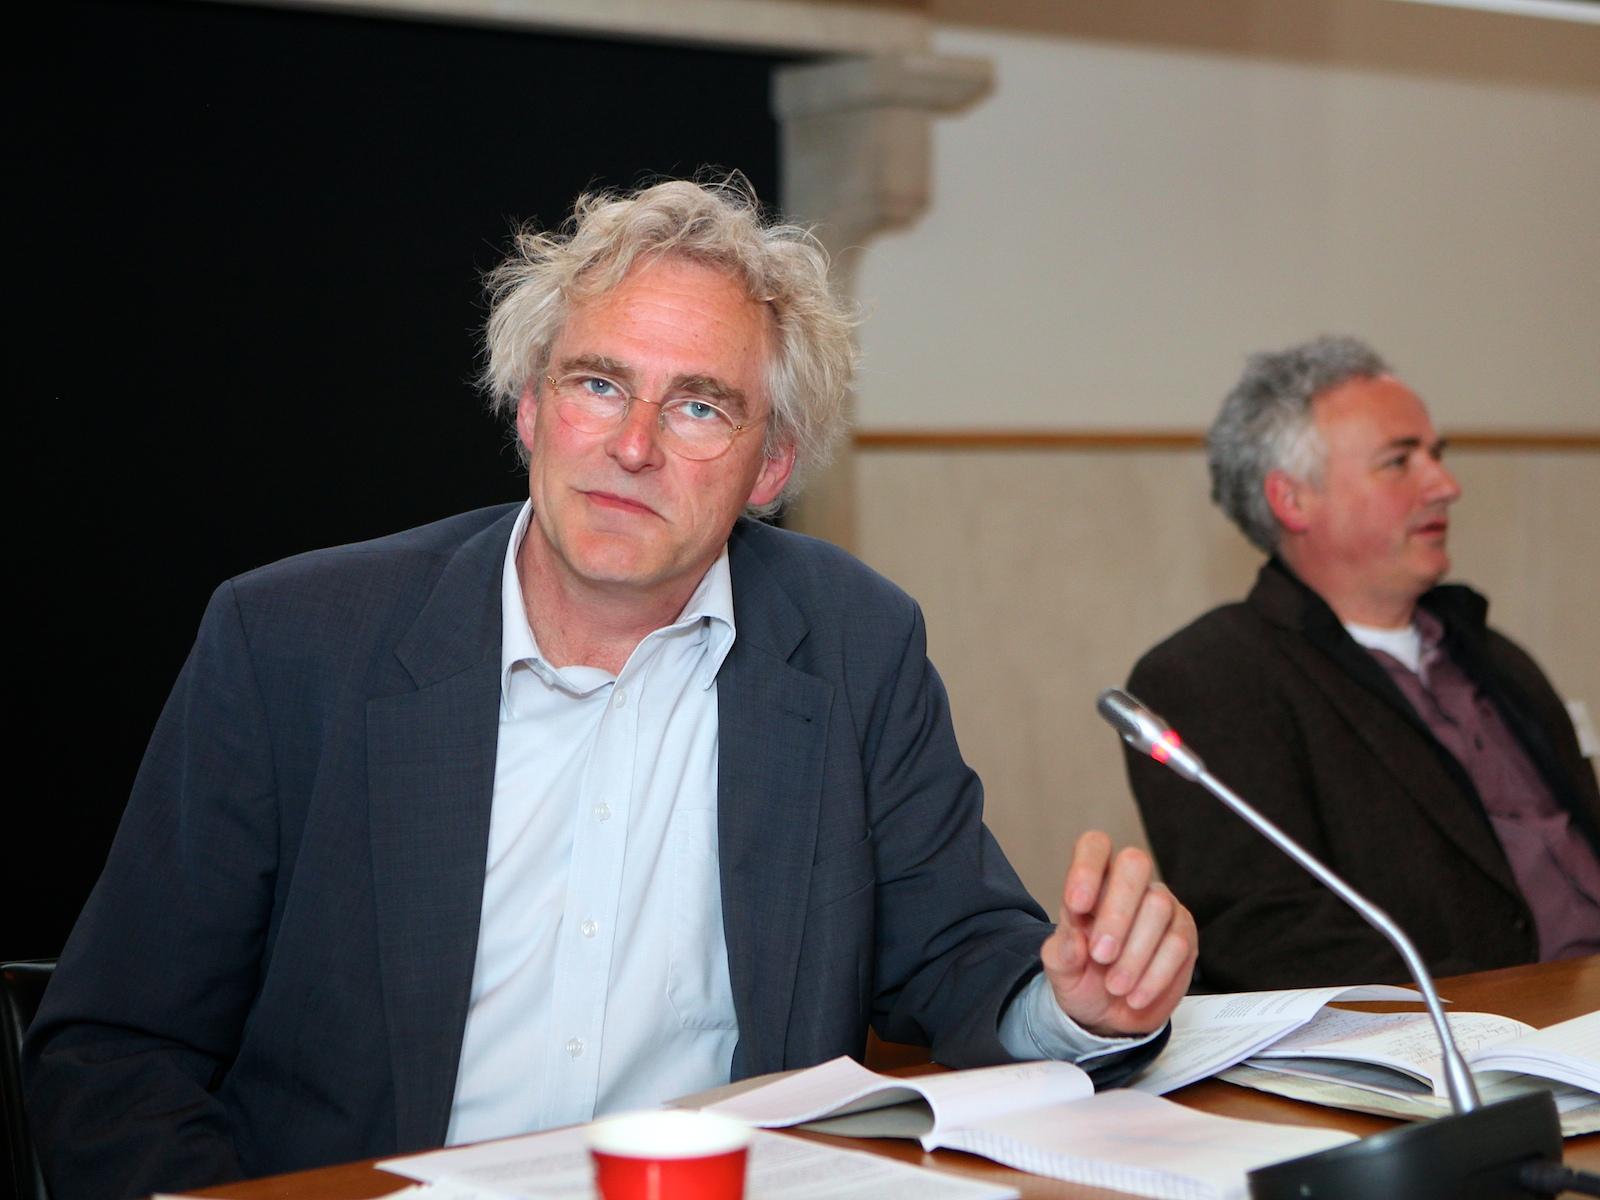 Dr. Rob van der Laarse